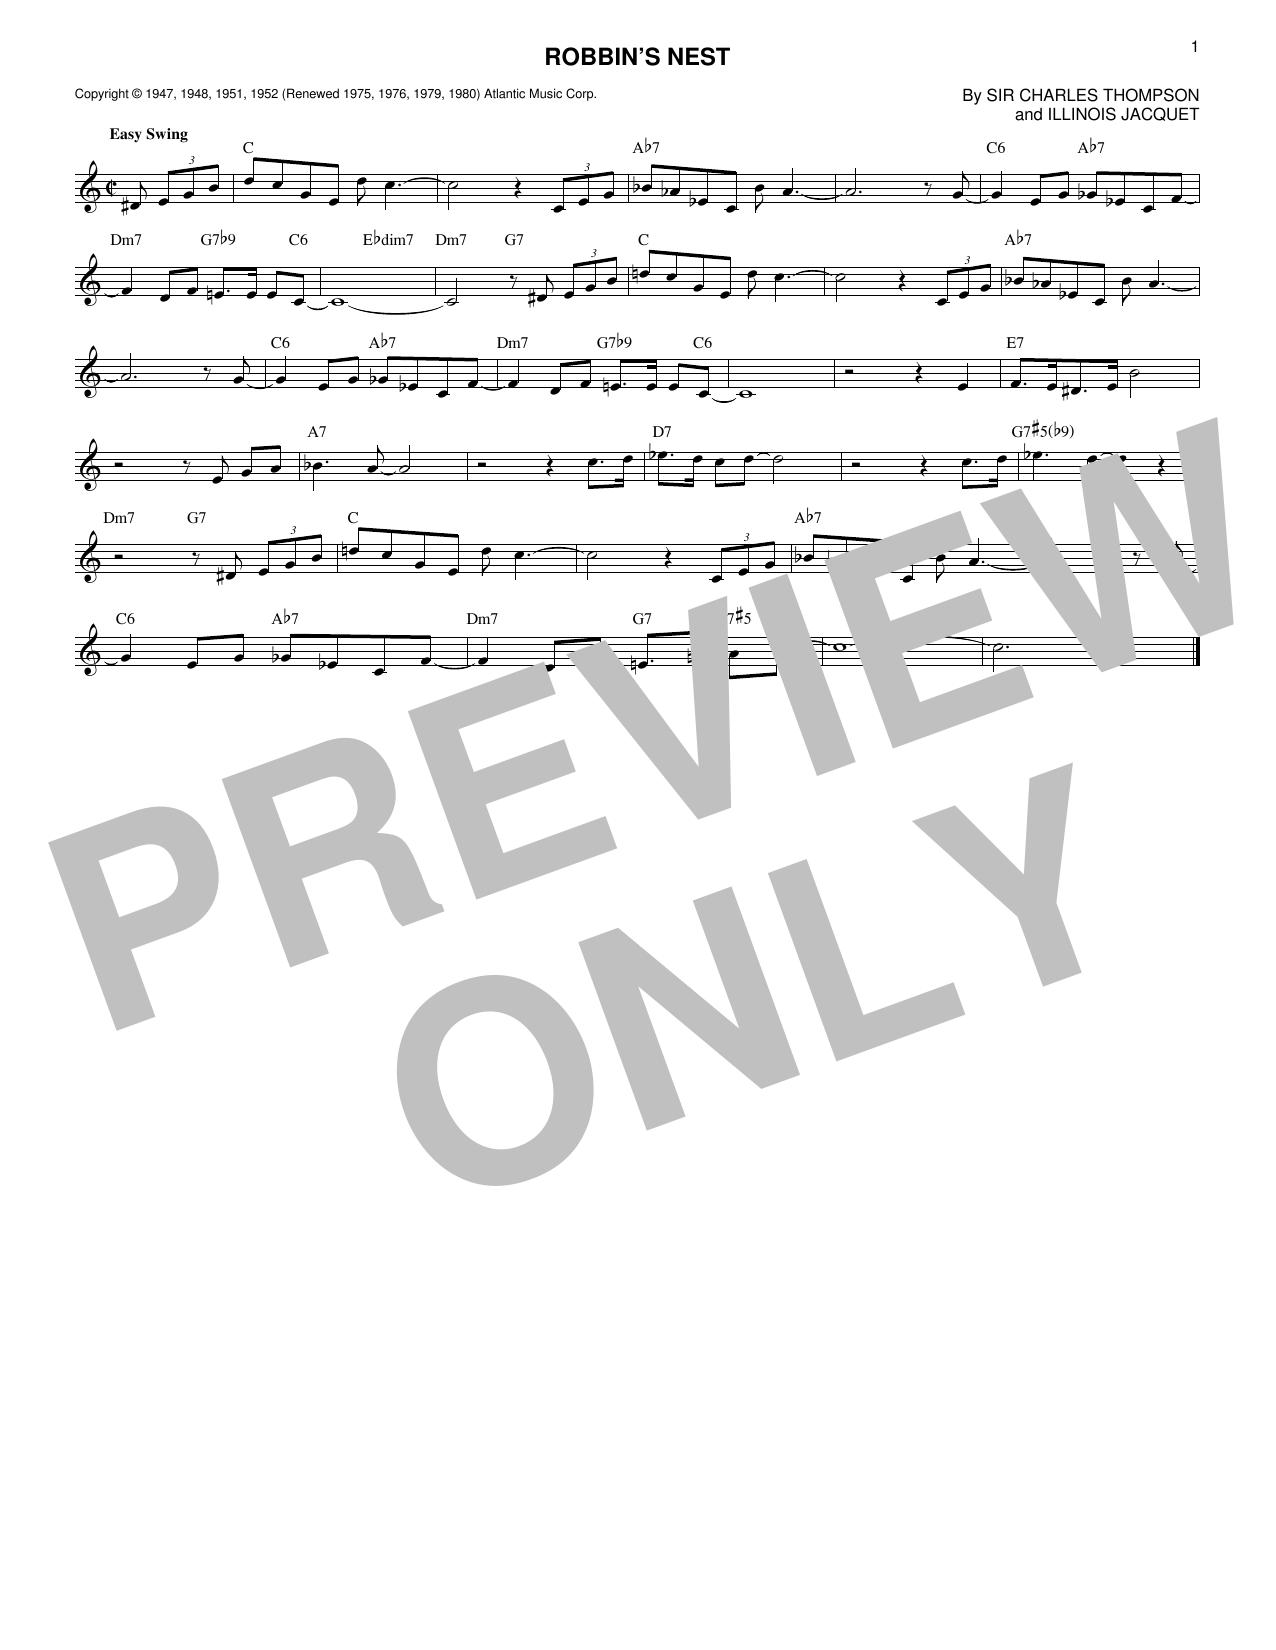 Ella Fitzgerald & Count Basie Robbins Nest sheet music notes printable PDF score